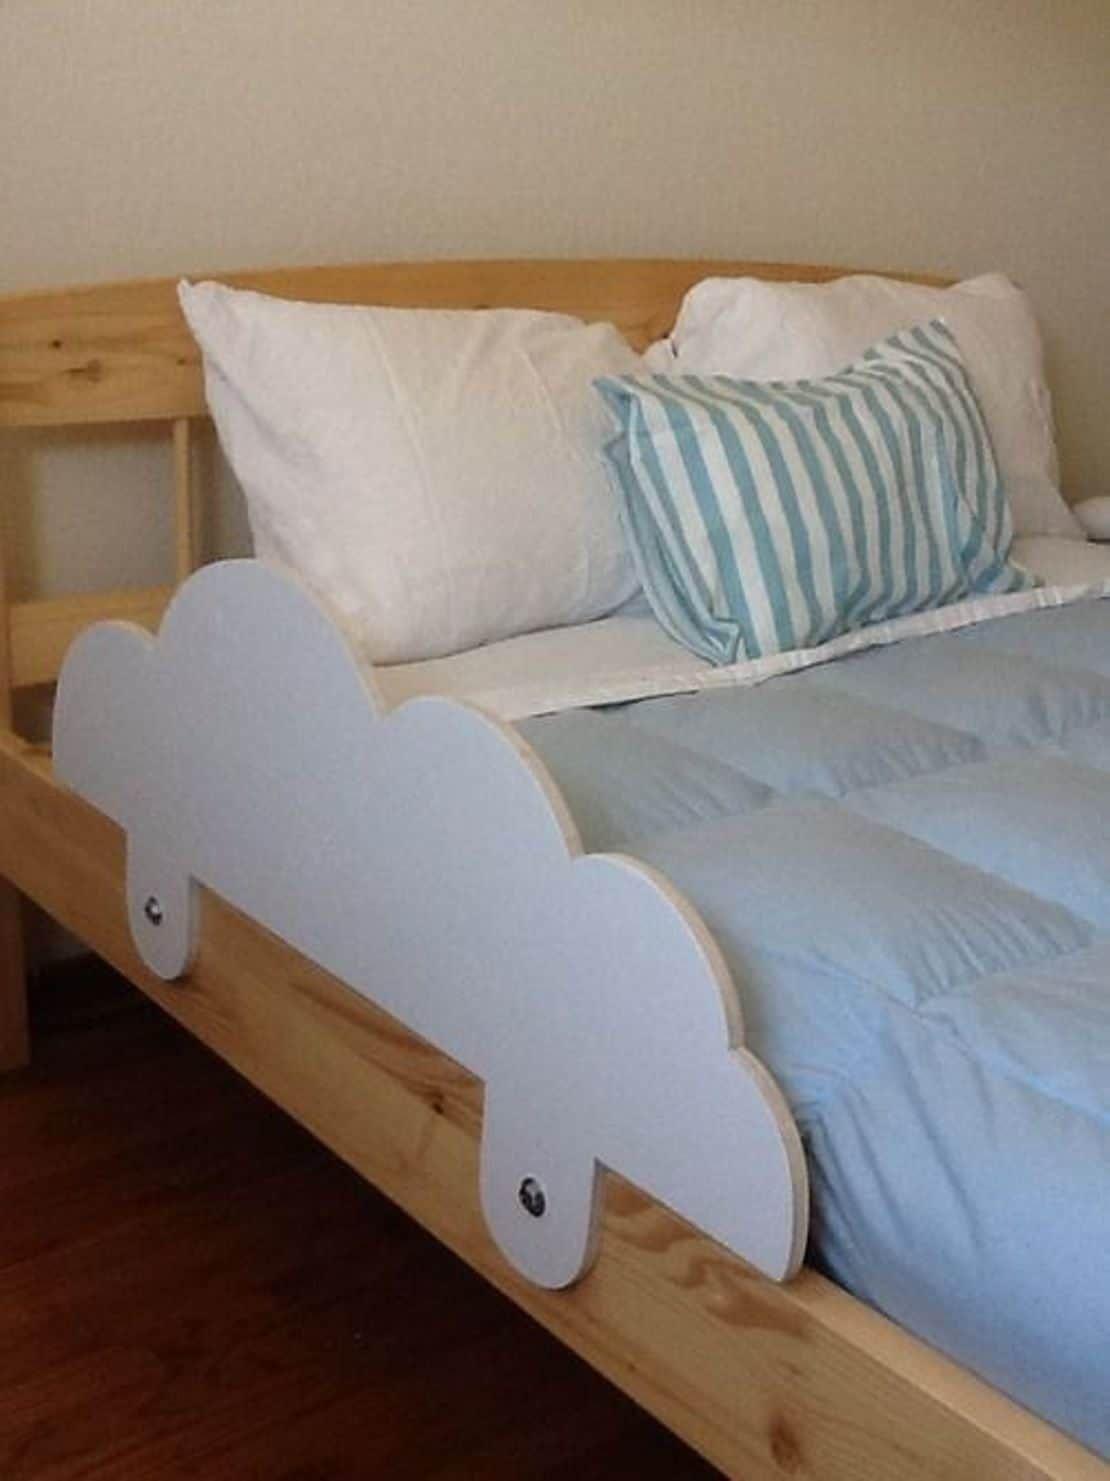 Functional Toddler Bed Rails In 2020 Diy Toddler Bed Bed Rails